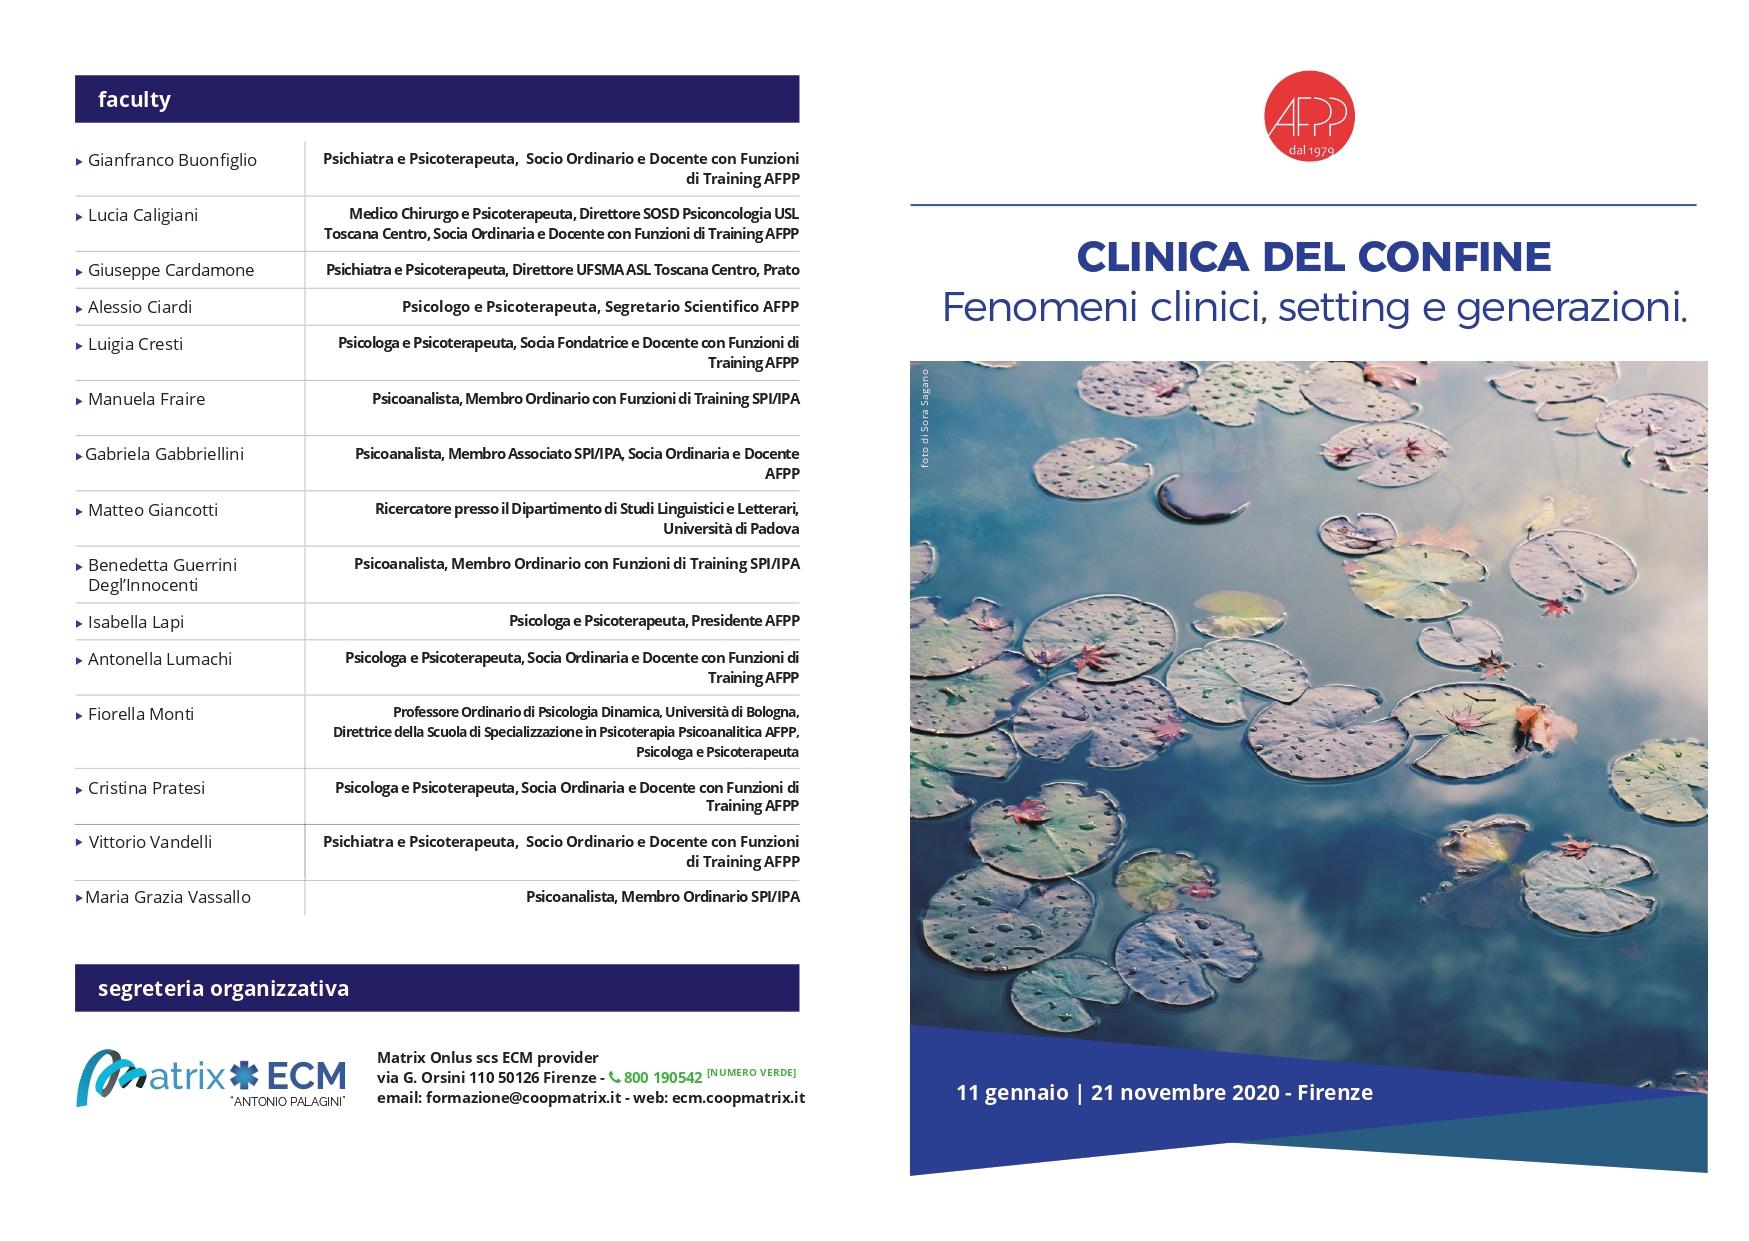 brochure-clinica-del-confine_rev3_page-0001